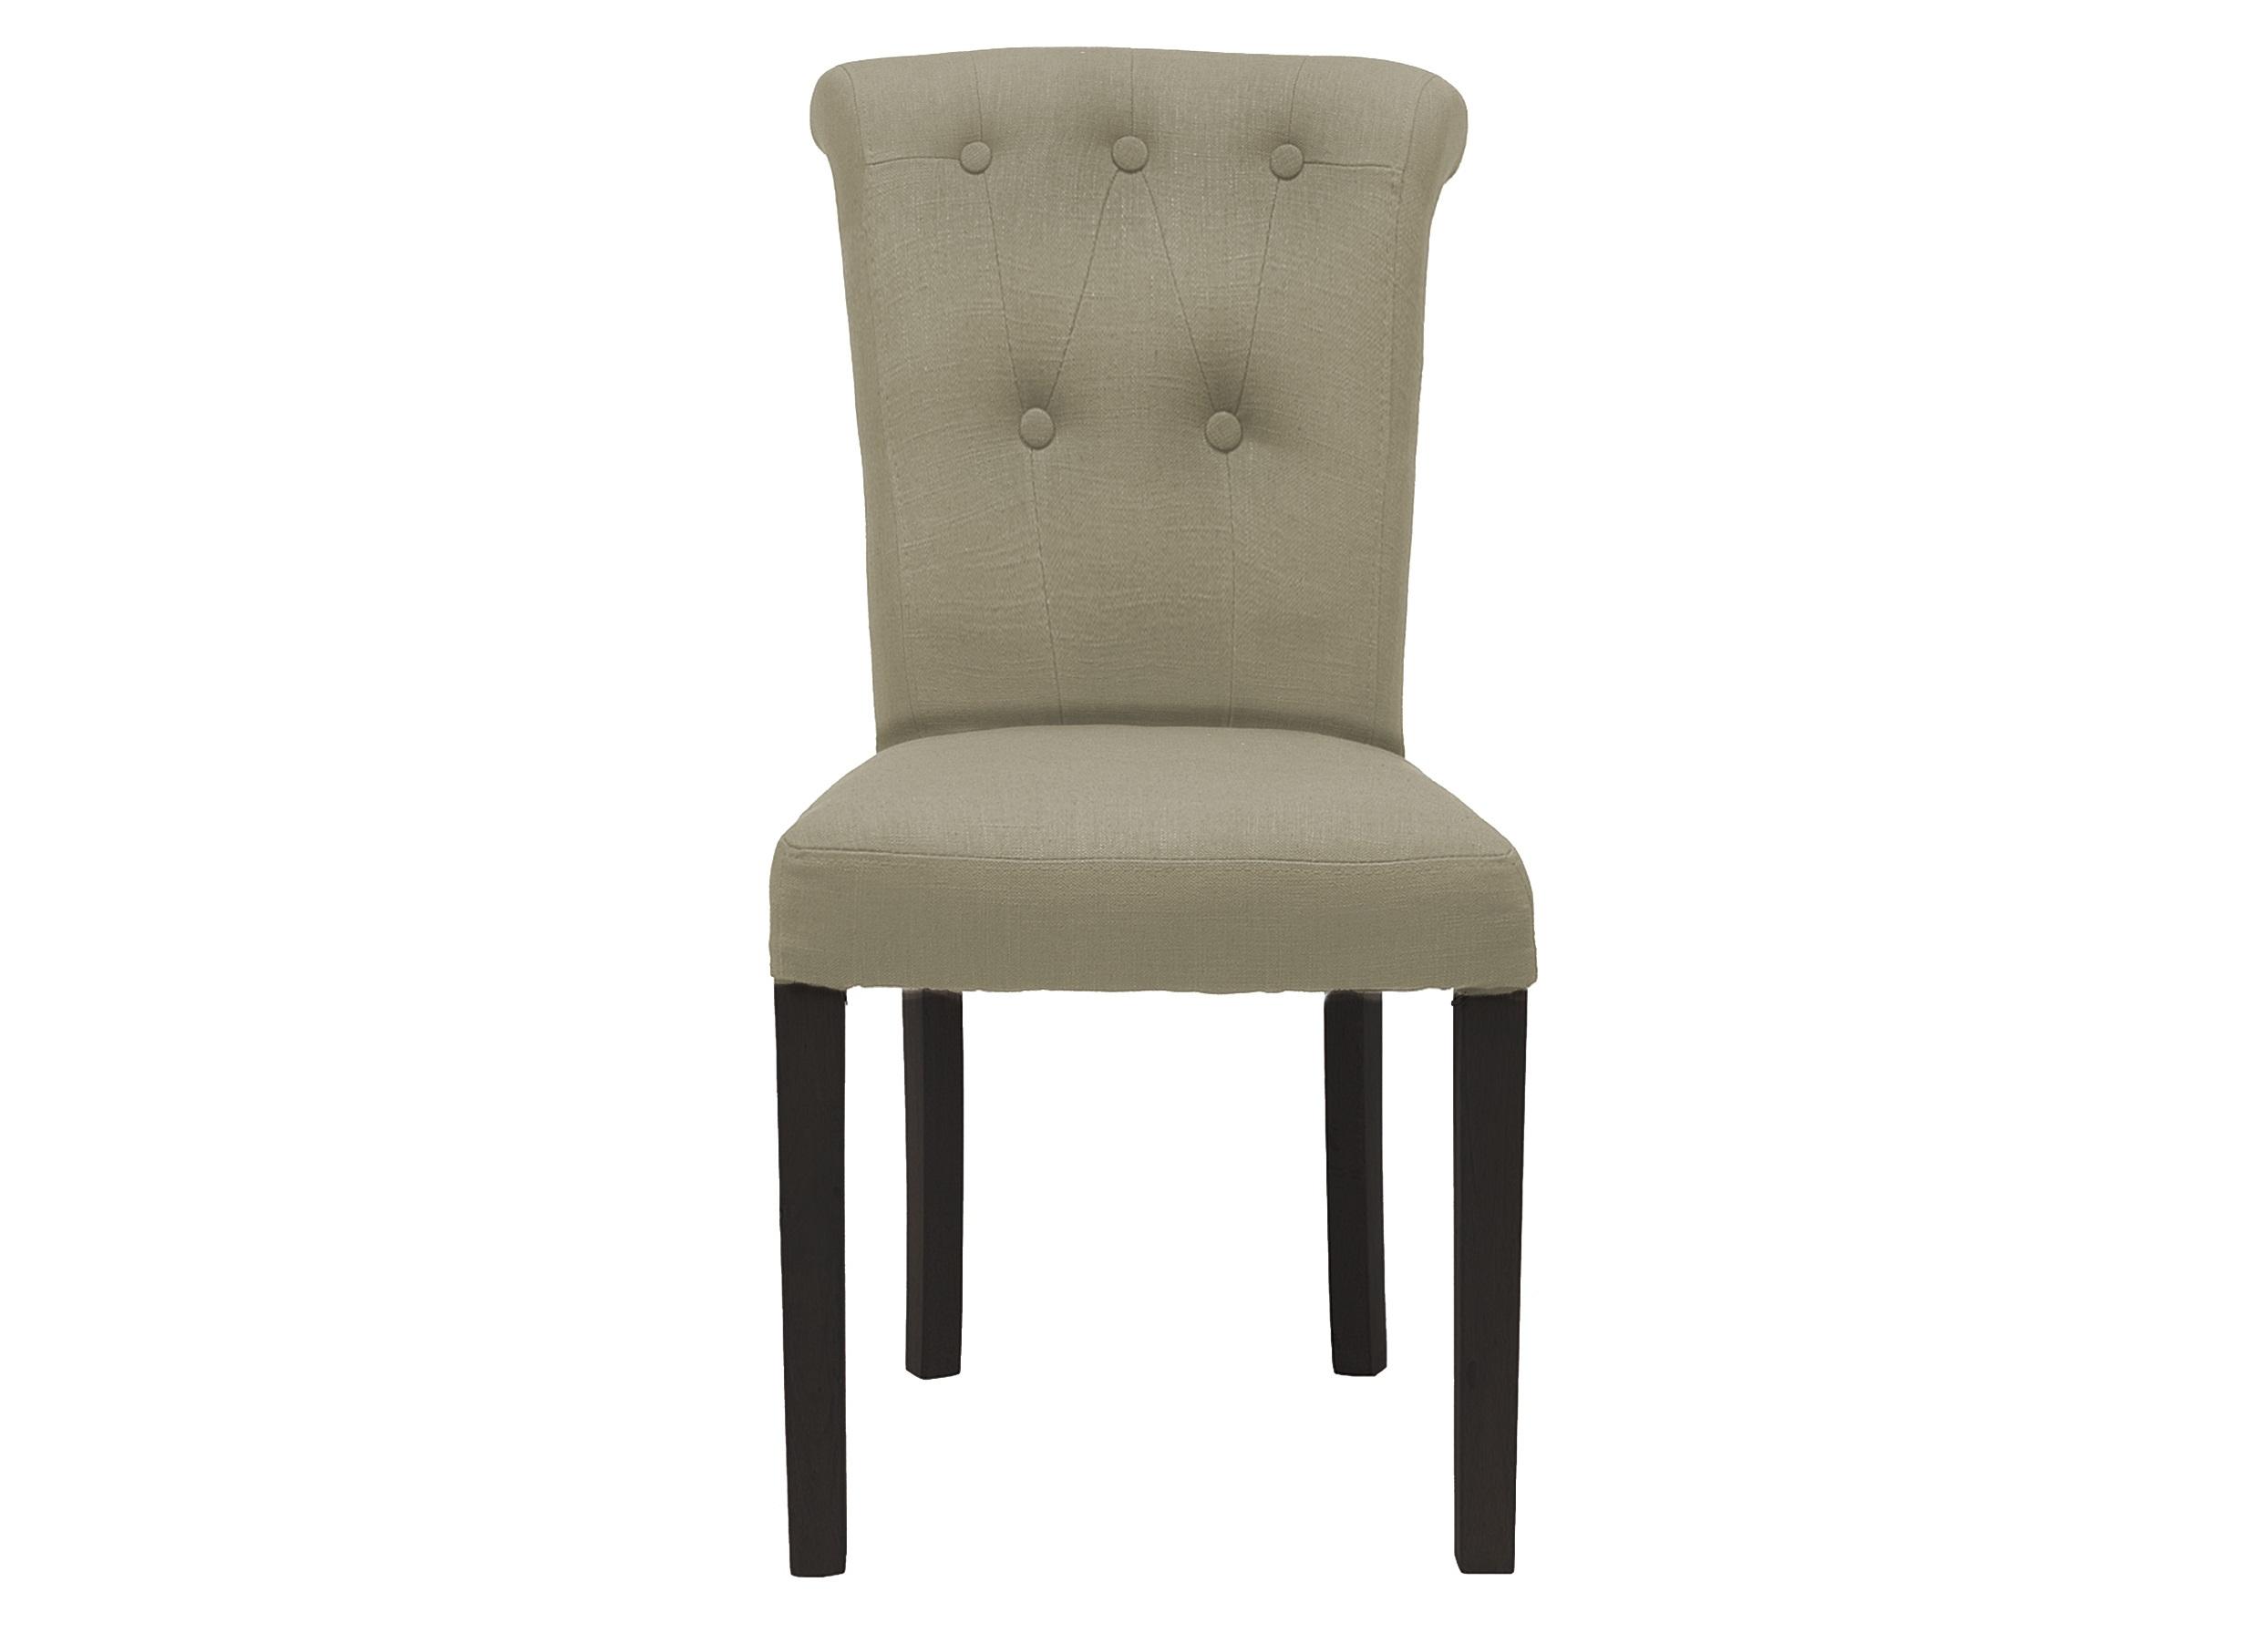 Стул SonderОбеденные стулья<br><br><br>Material: Лен<br>Length см: None<br>Width см: 67<br>Depth см: 49<br>Height см: 91,5